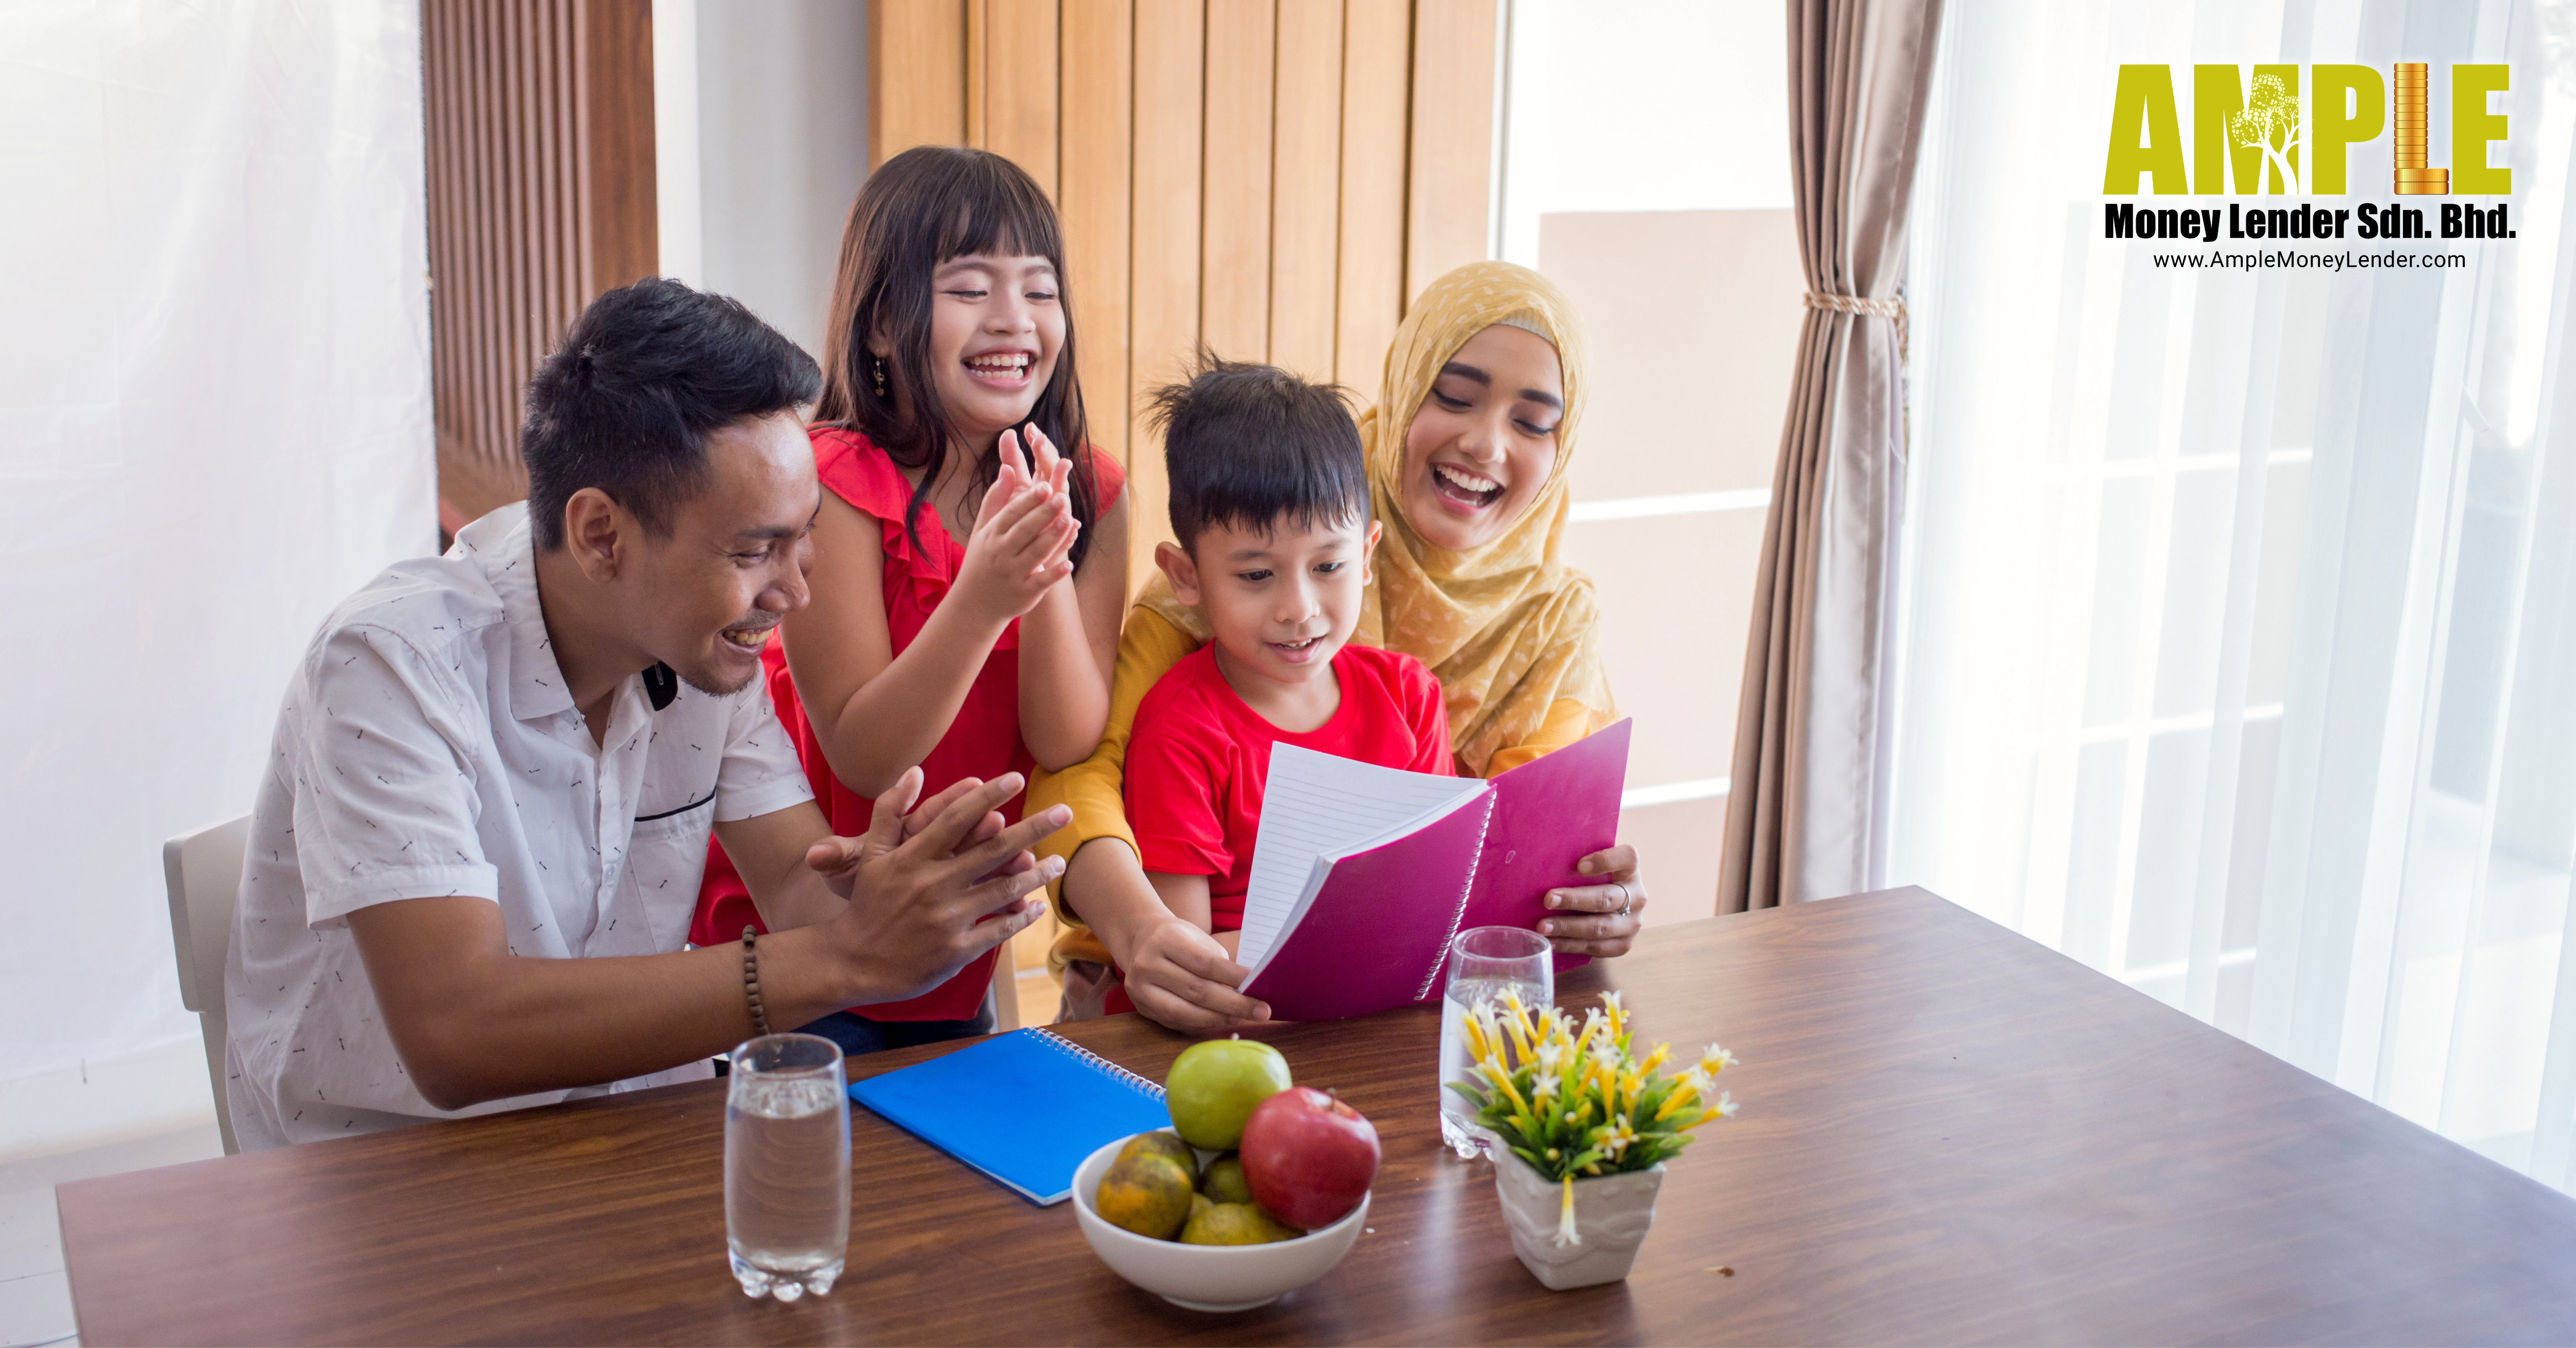 Ample Money Lender Malaysia Johor Batu Pahat Loan Licensed Money Lender Personal Loan Business Loan Cash Capital Finance Low Interest Banking Service Cheque Changes Cash EN A004